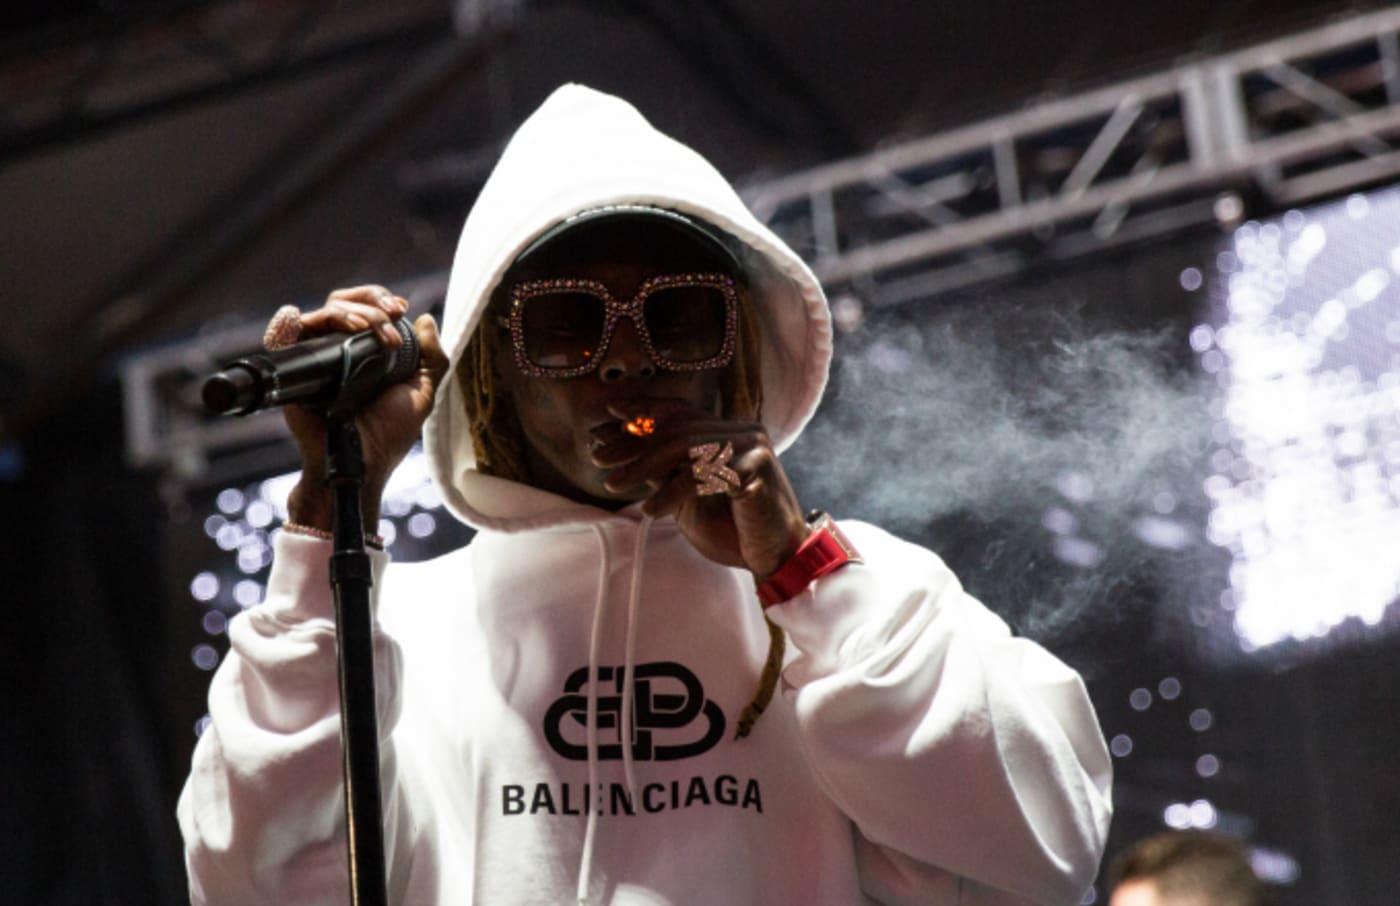 Rapper Lil Wayne performs onstage during JMBLYA at Fair Park